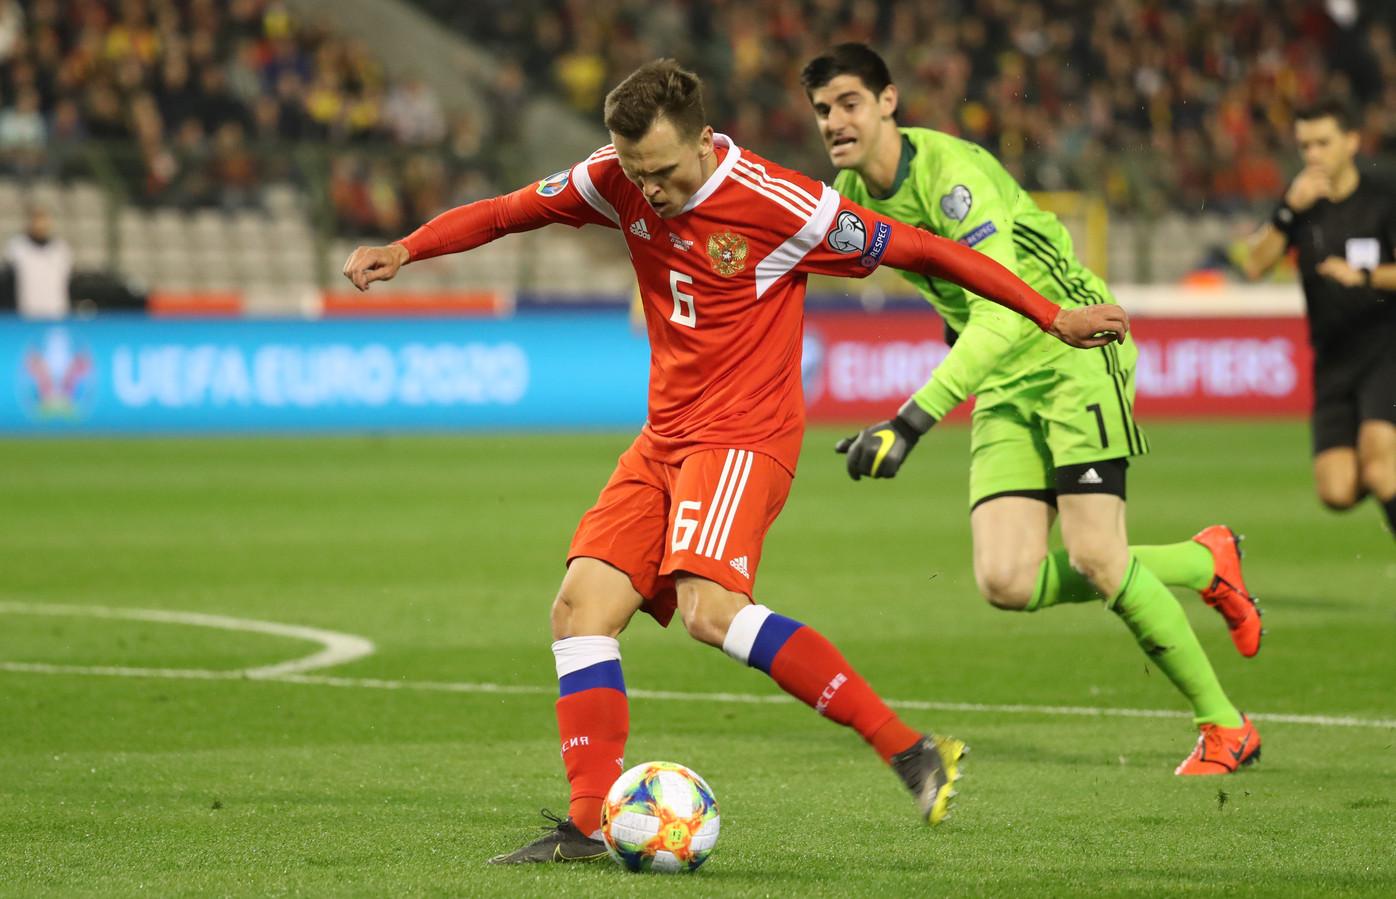 Denis Cheryshev straft een grote fout van Thibaut Courtois af.